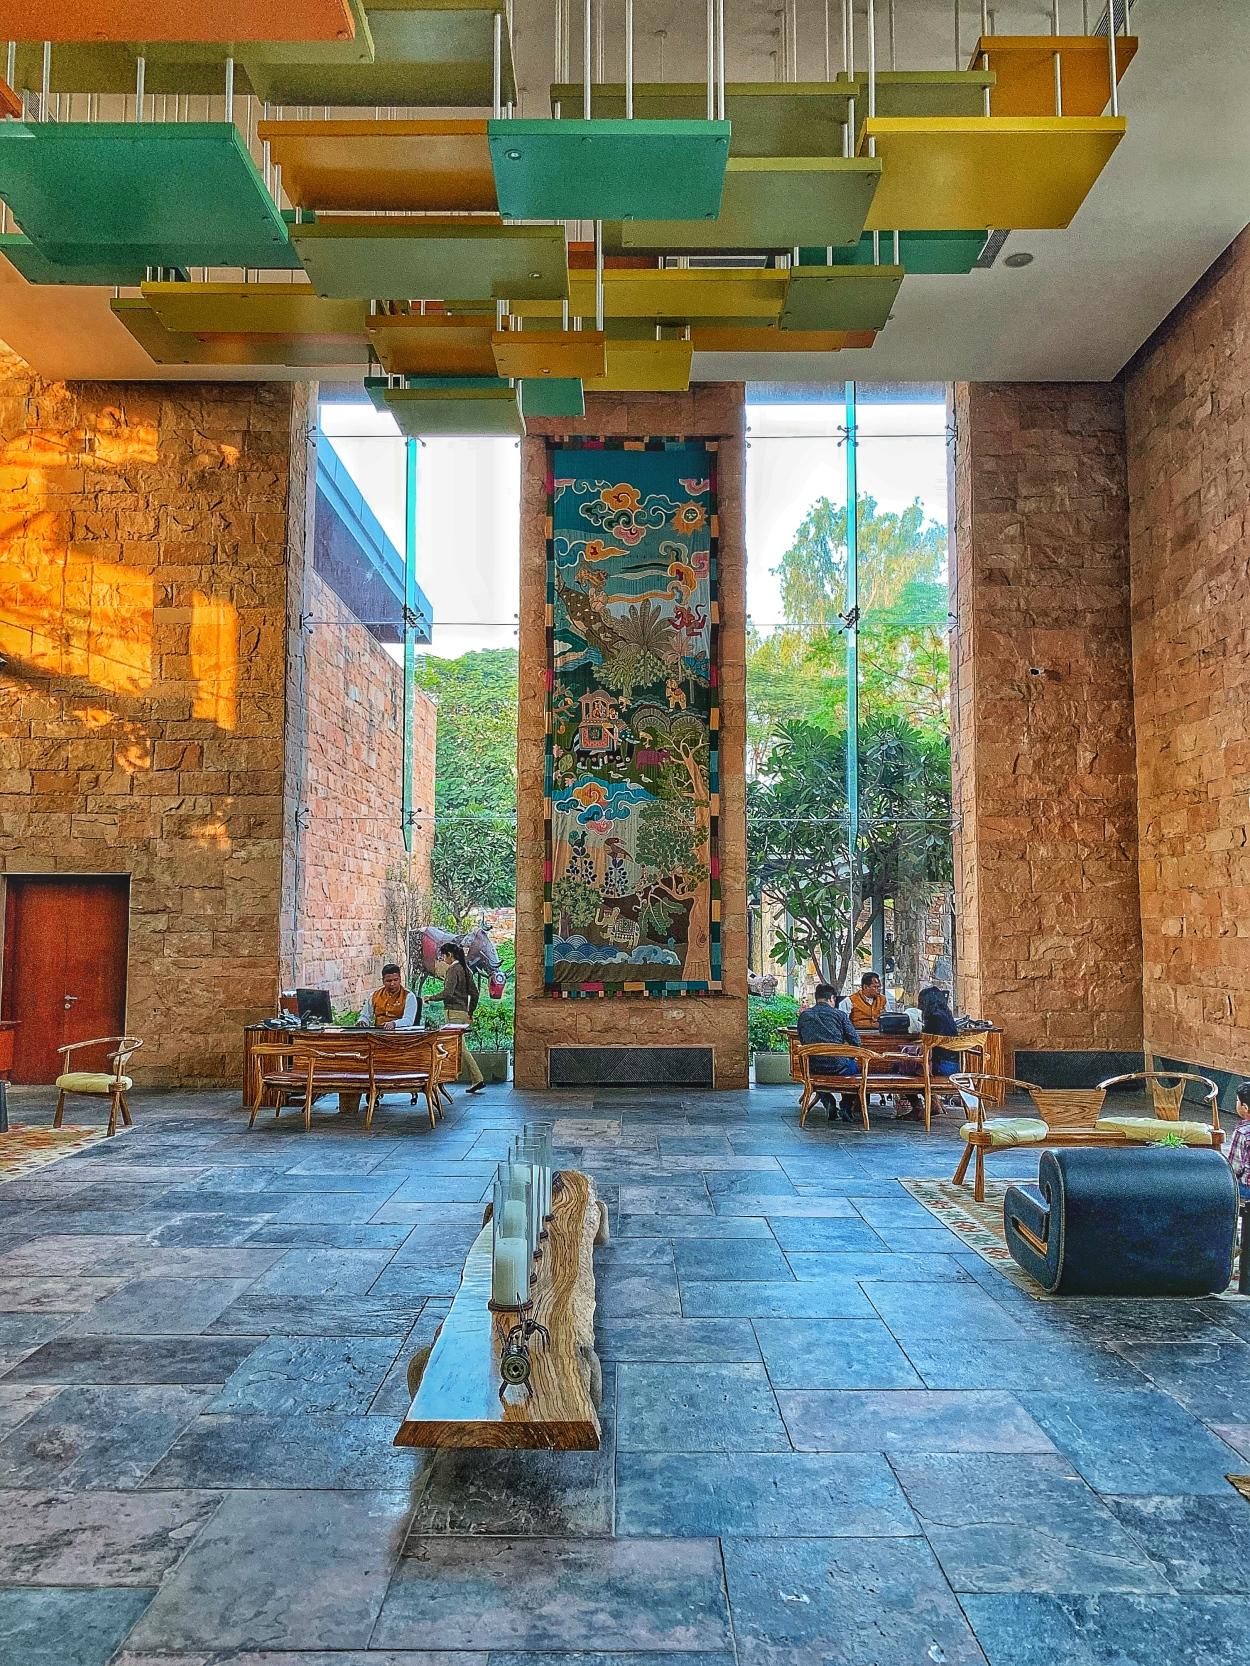 Lobby at Taj Hotel Damdama